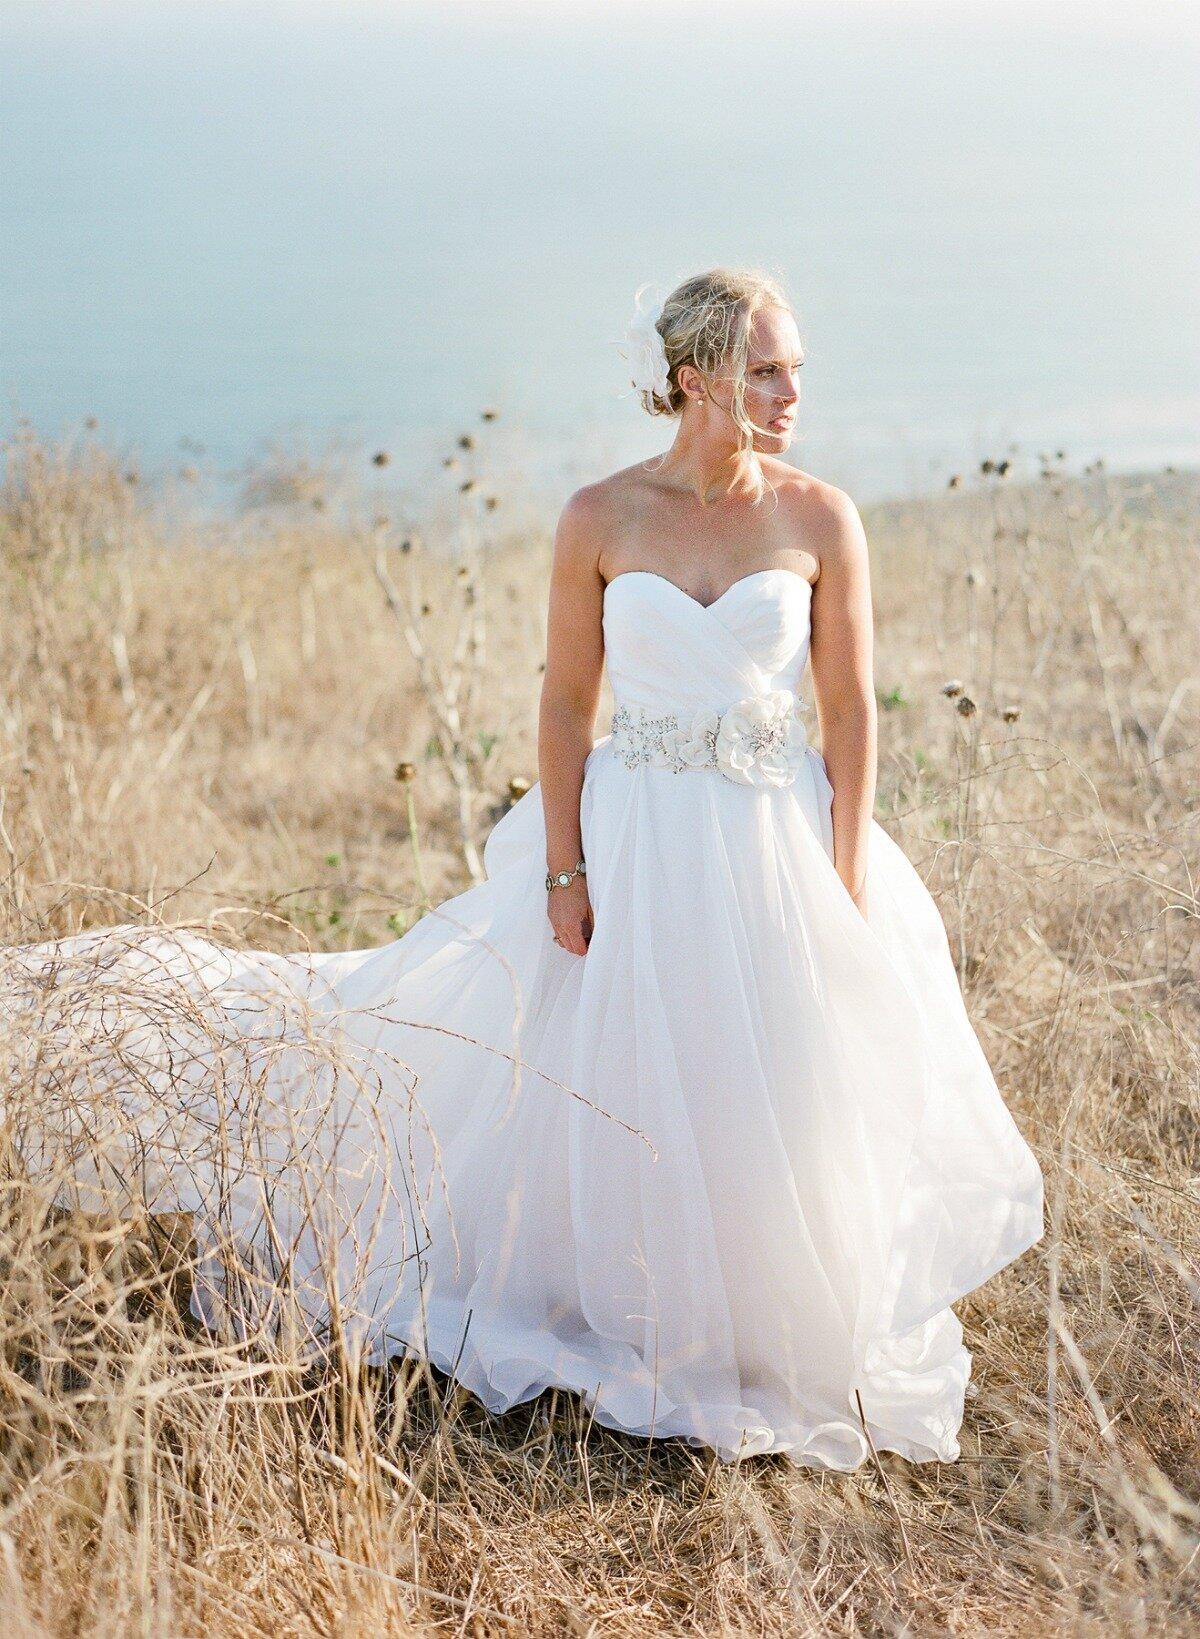 wedding dresses santa barbara pictures ideas guide to With wedding dress santa barbara